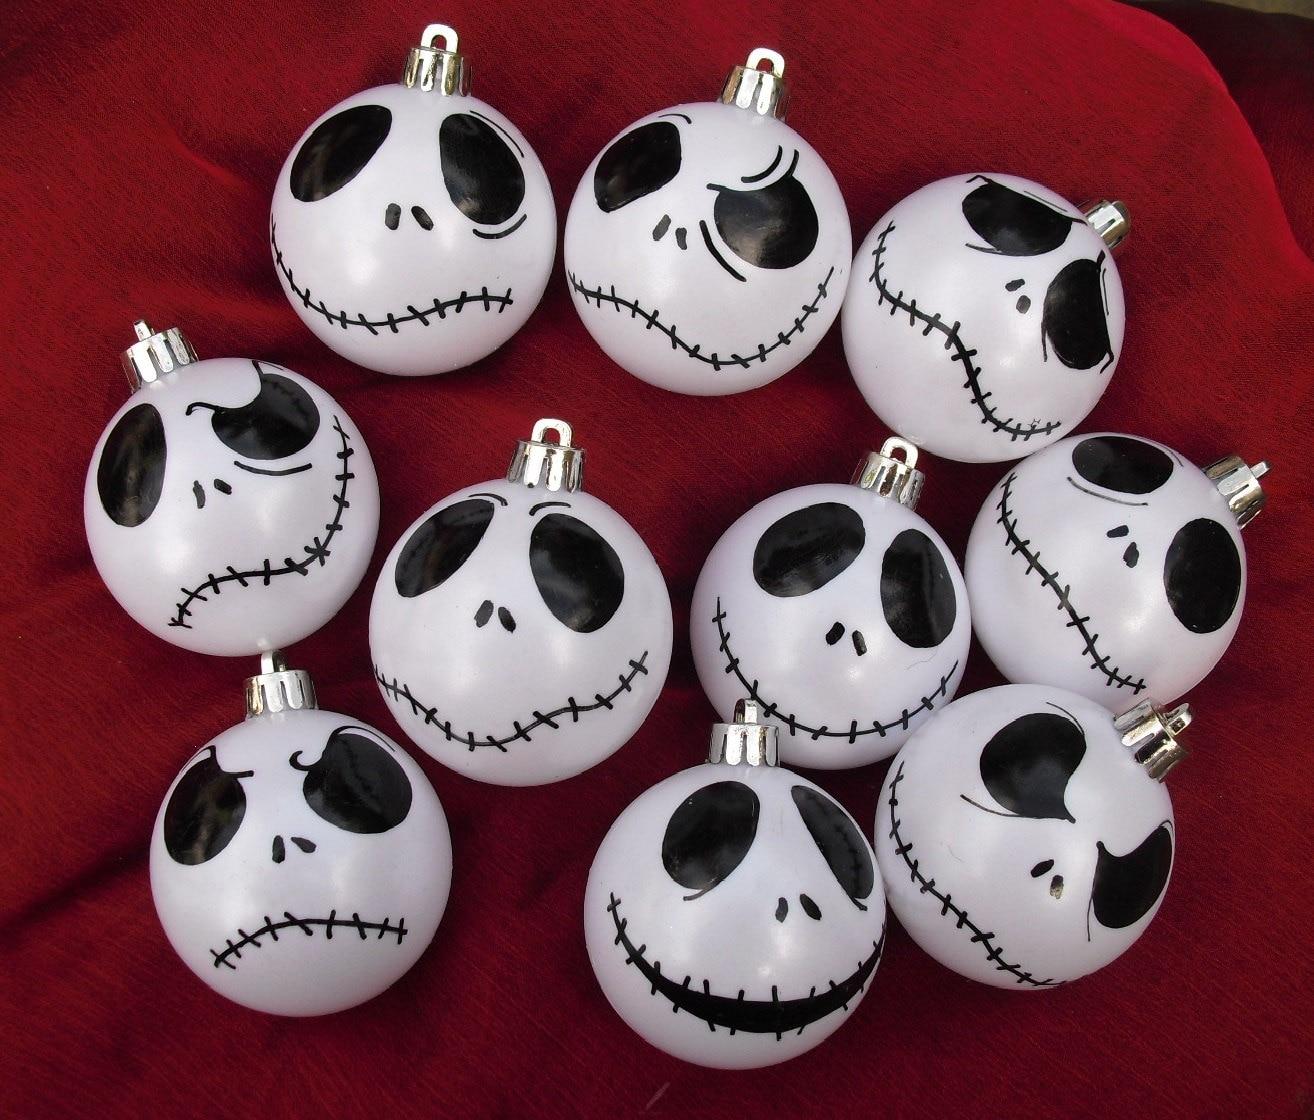 Set Of 9 Jack Skellington Ornaments By Dressingerroomcorner